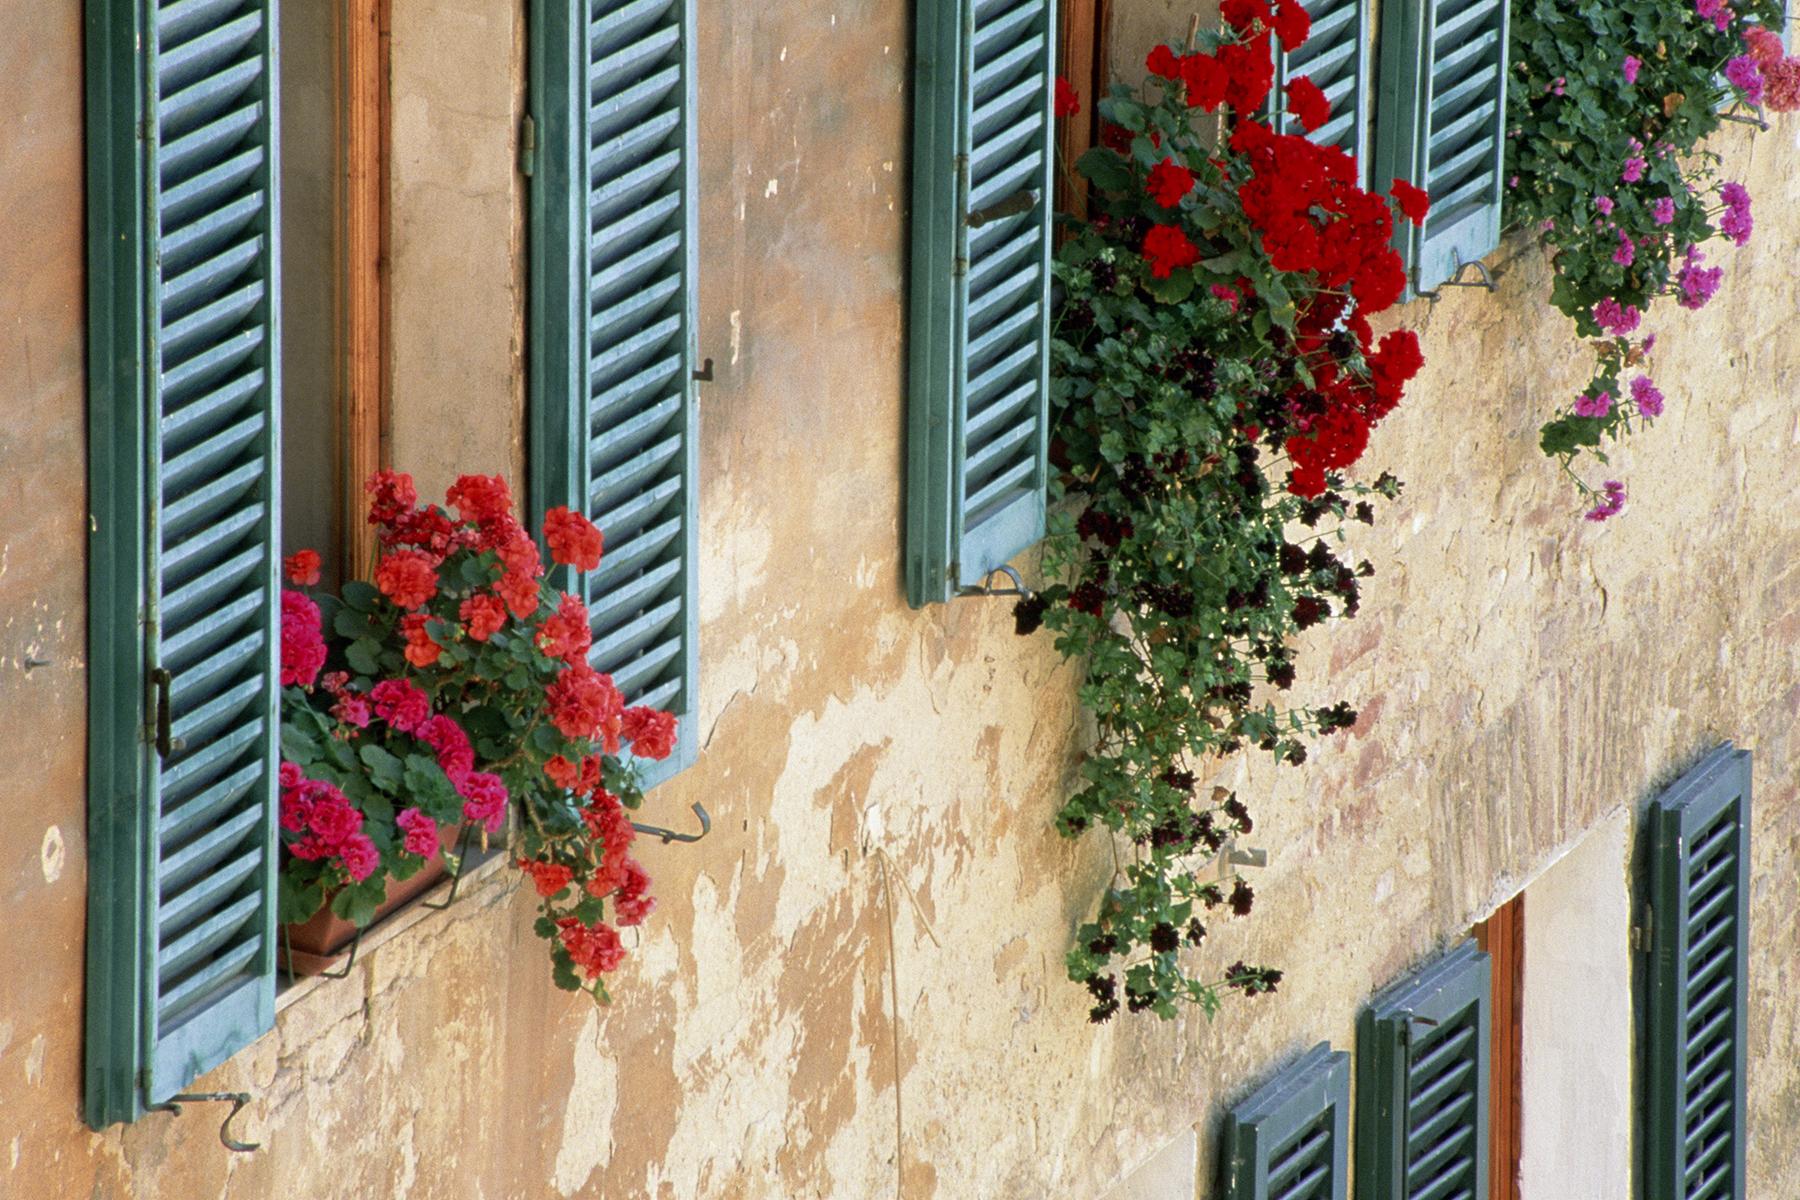 Alison Shutters, Tuscany, Italy